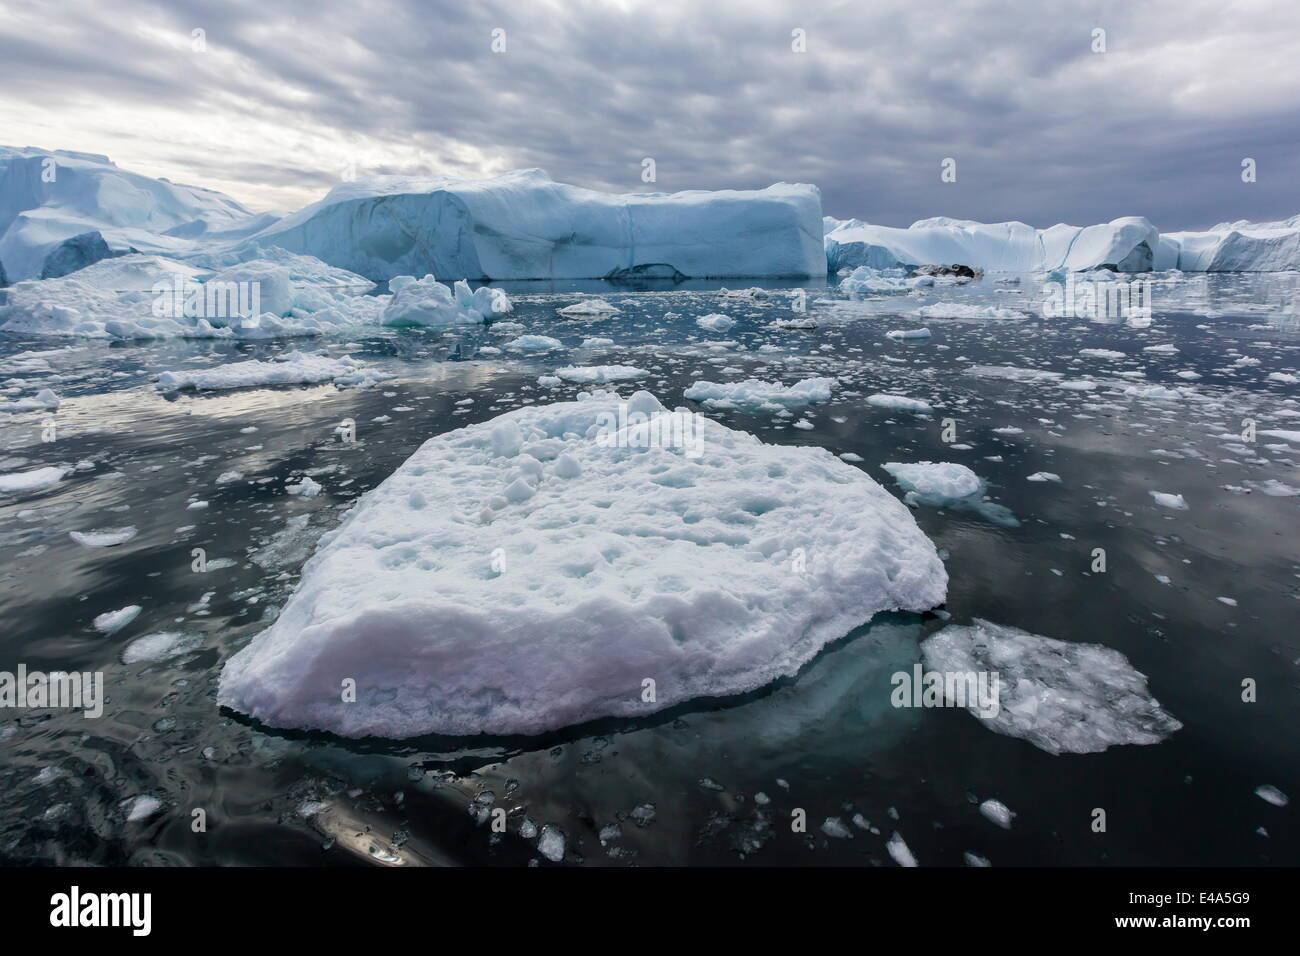 Huge icebergs calved from the Ilulissat Glacier, UNESCO World Heritage Site, Ilulissat, Greenland, Polar Regions - Stock Image